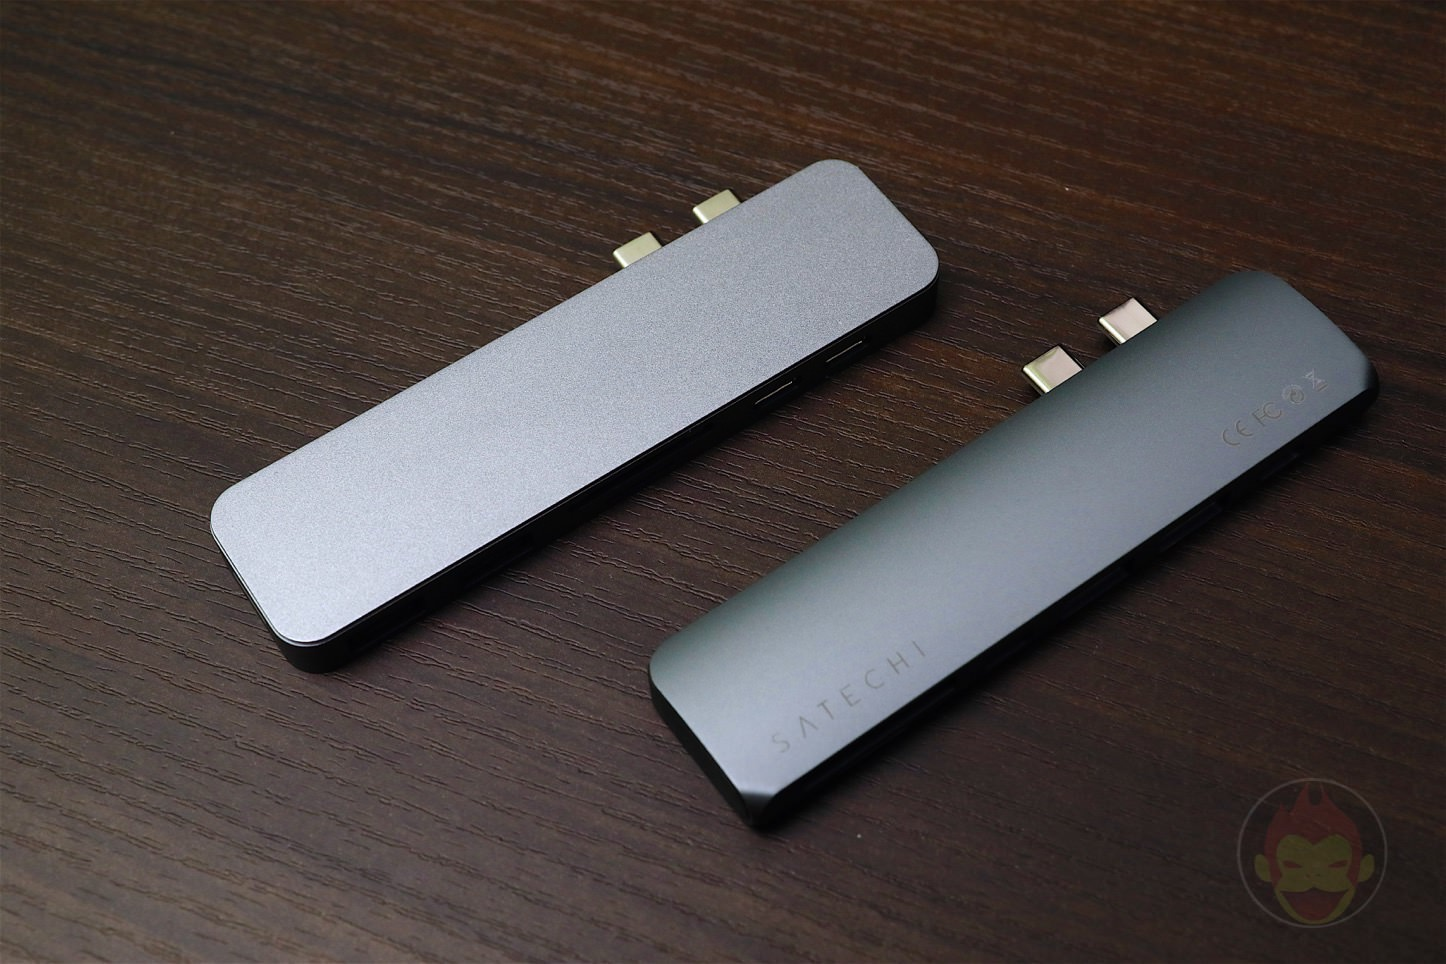 Satechi-TypeC-Pro-Hub-VS-HyperDrive-USBC-Hub-07.jpg